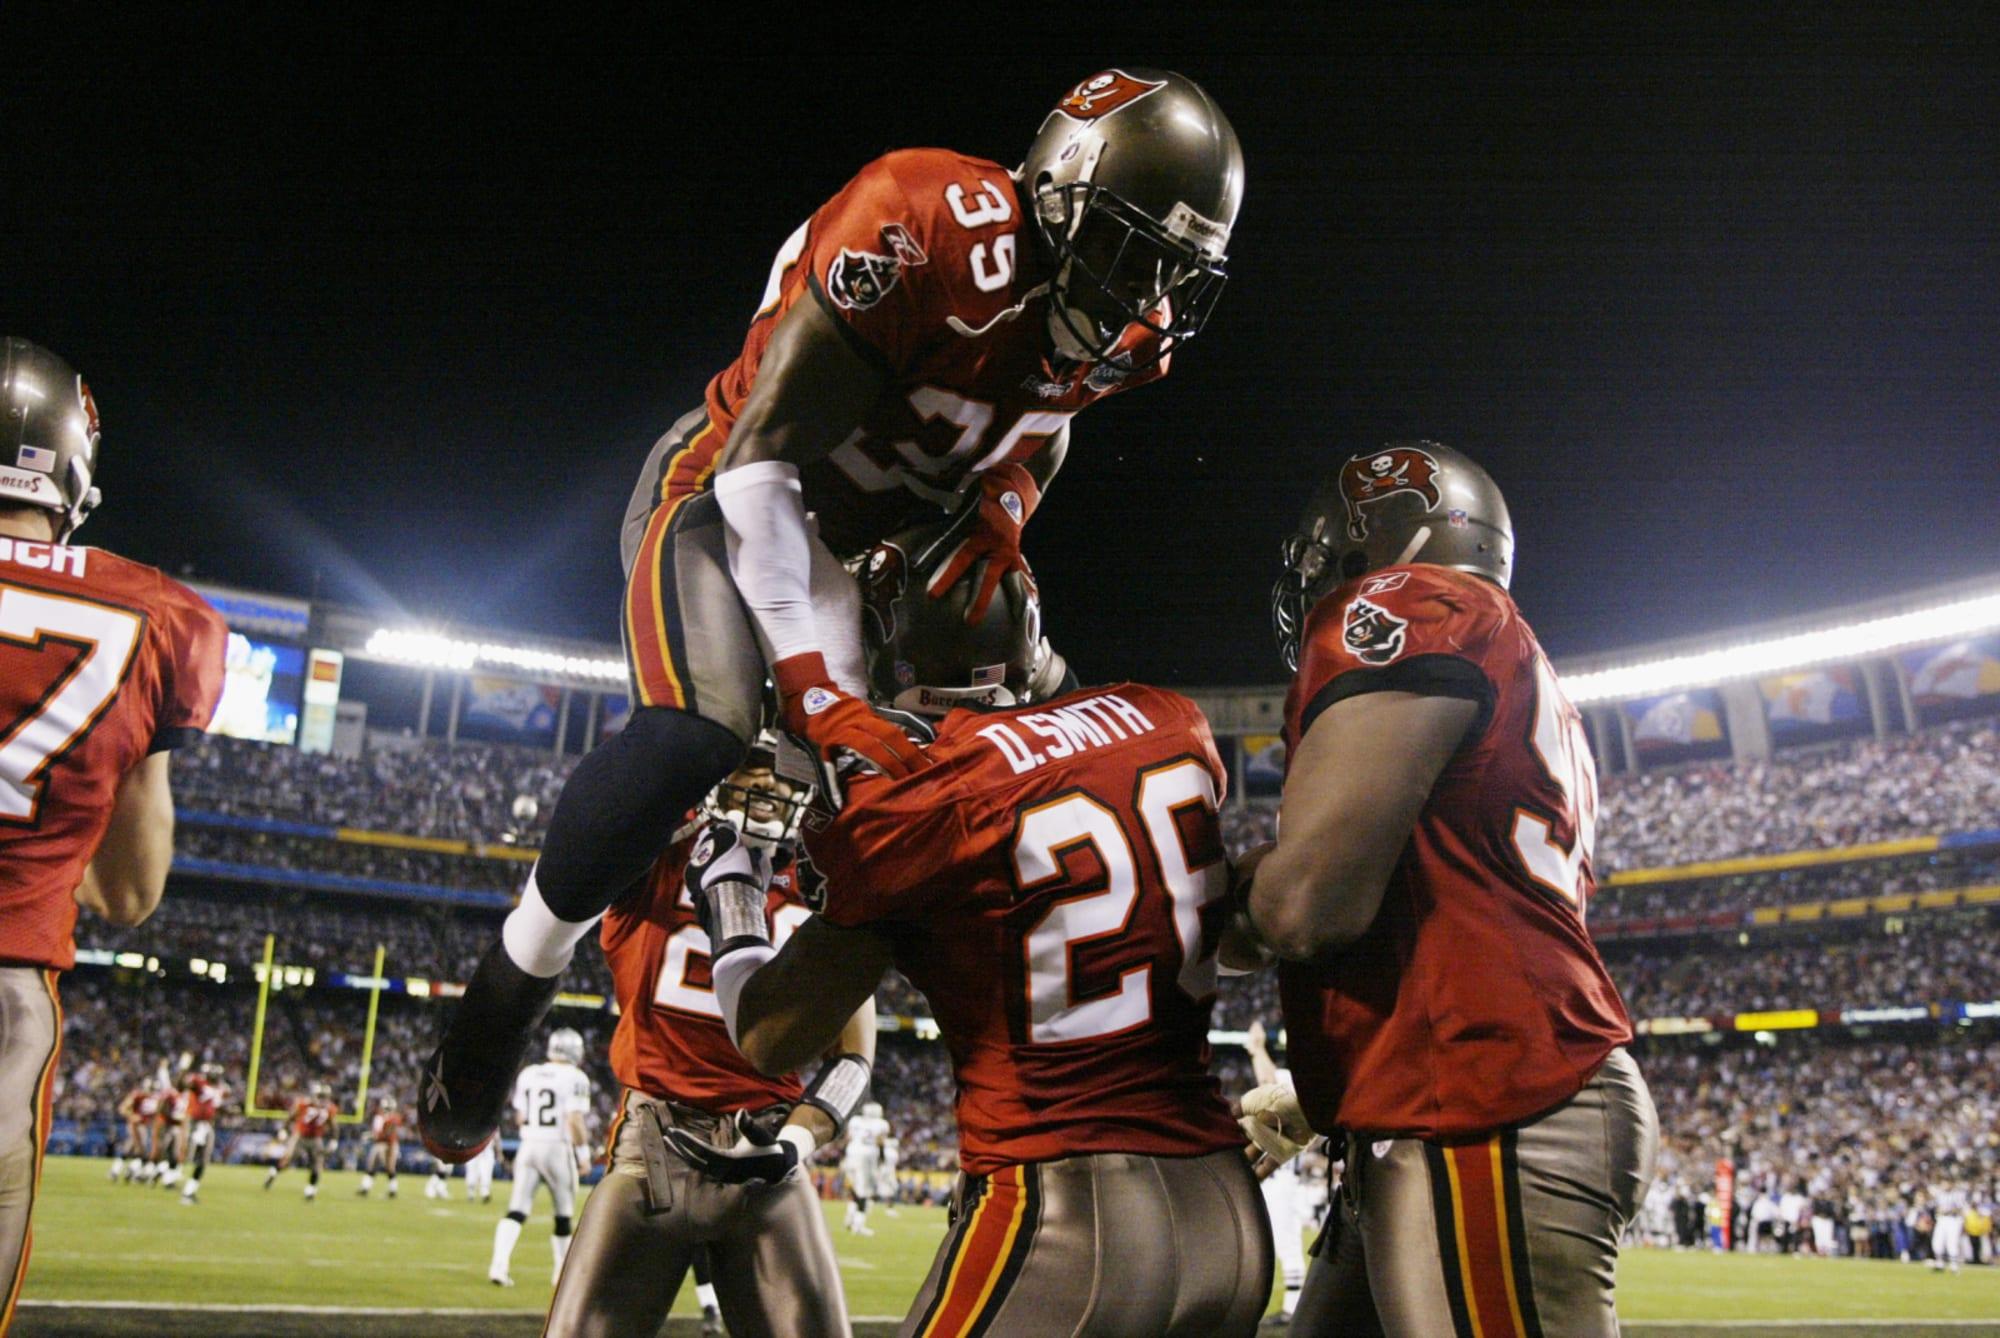 Buccaneers: It's time to bring back Super Bowl-era uniforms